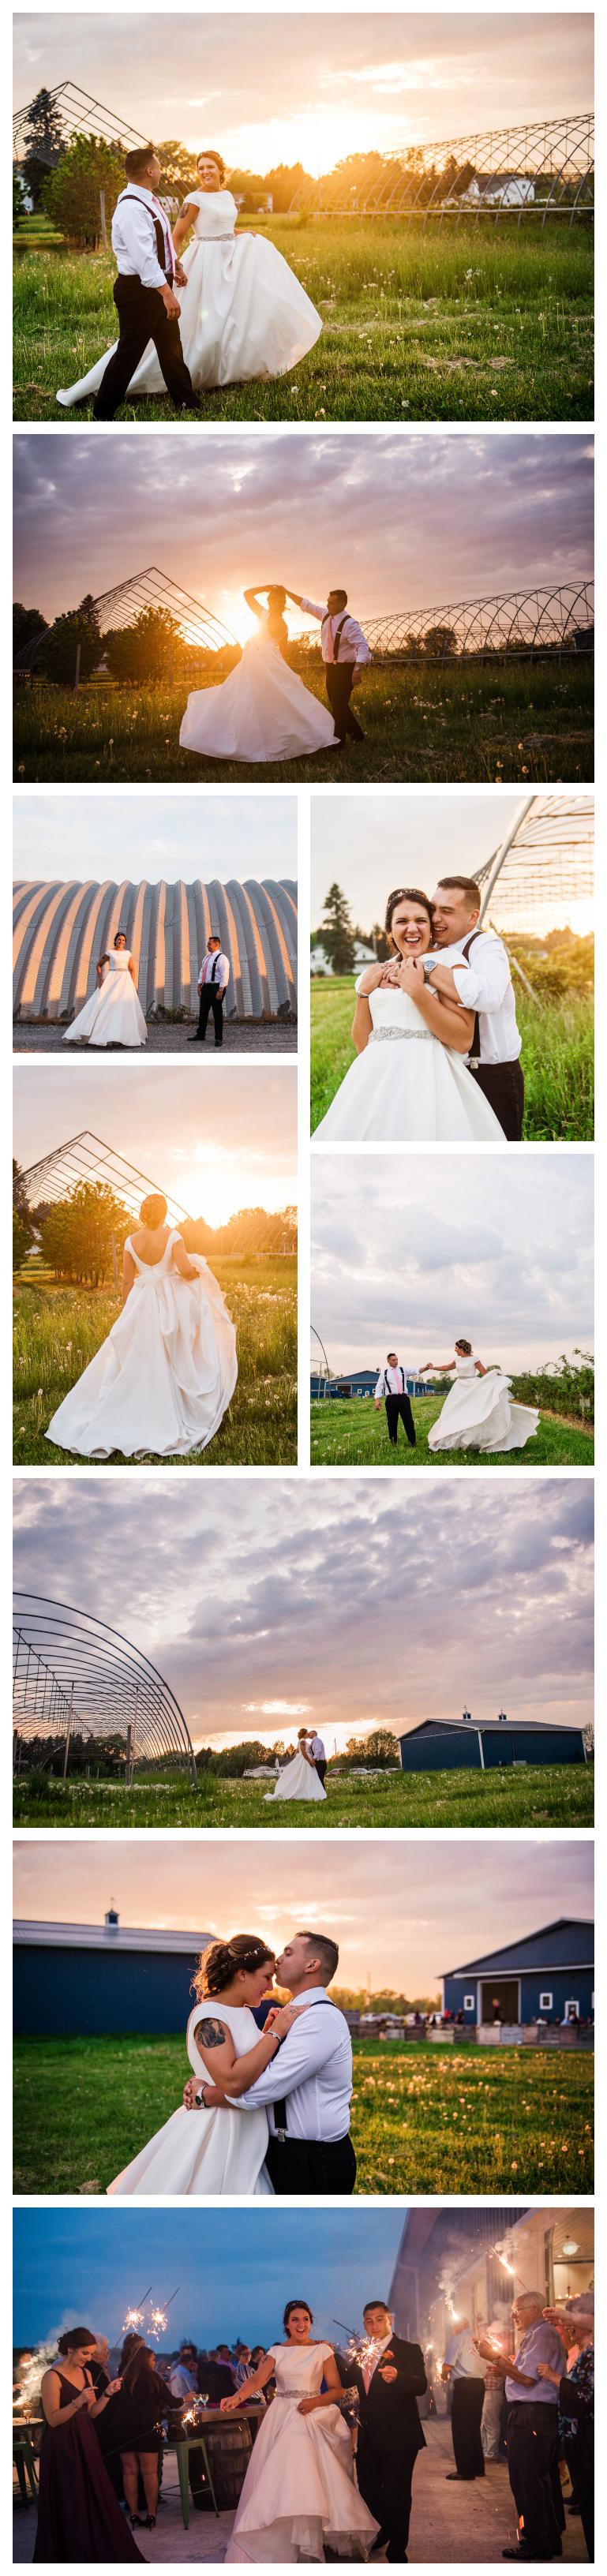 Blue_Barn_Rochester_Wedding_JILL_STUDIO_1.jpg